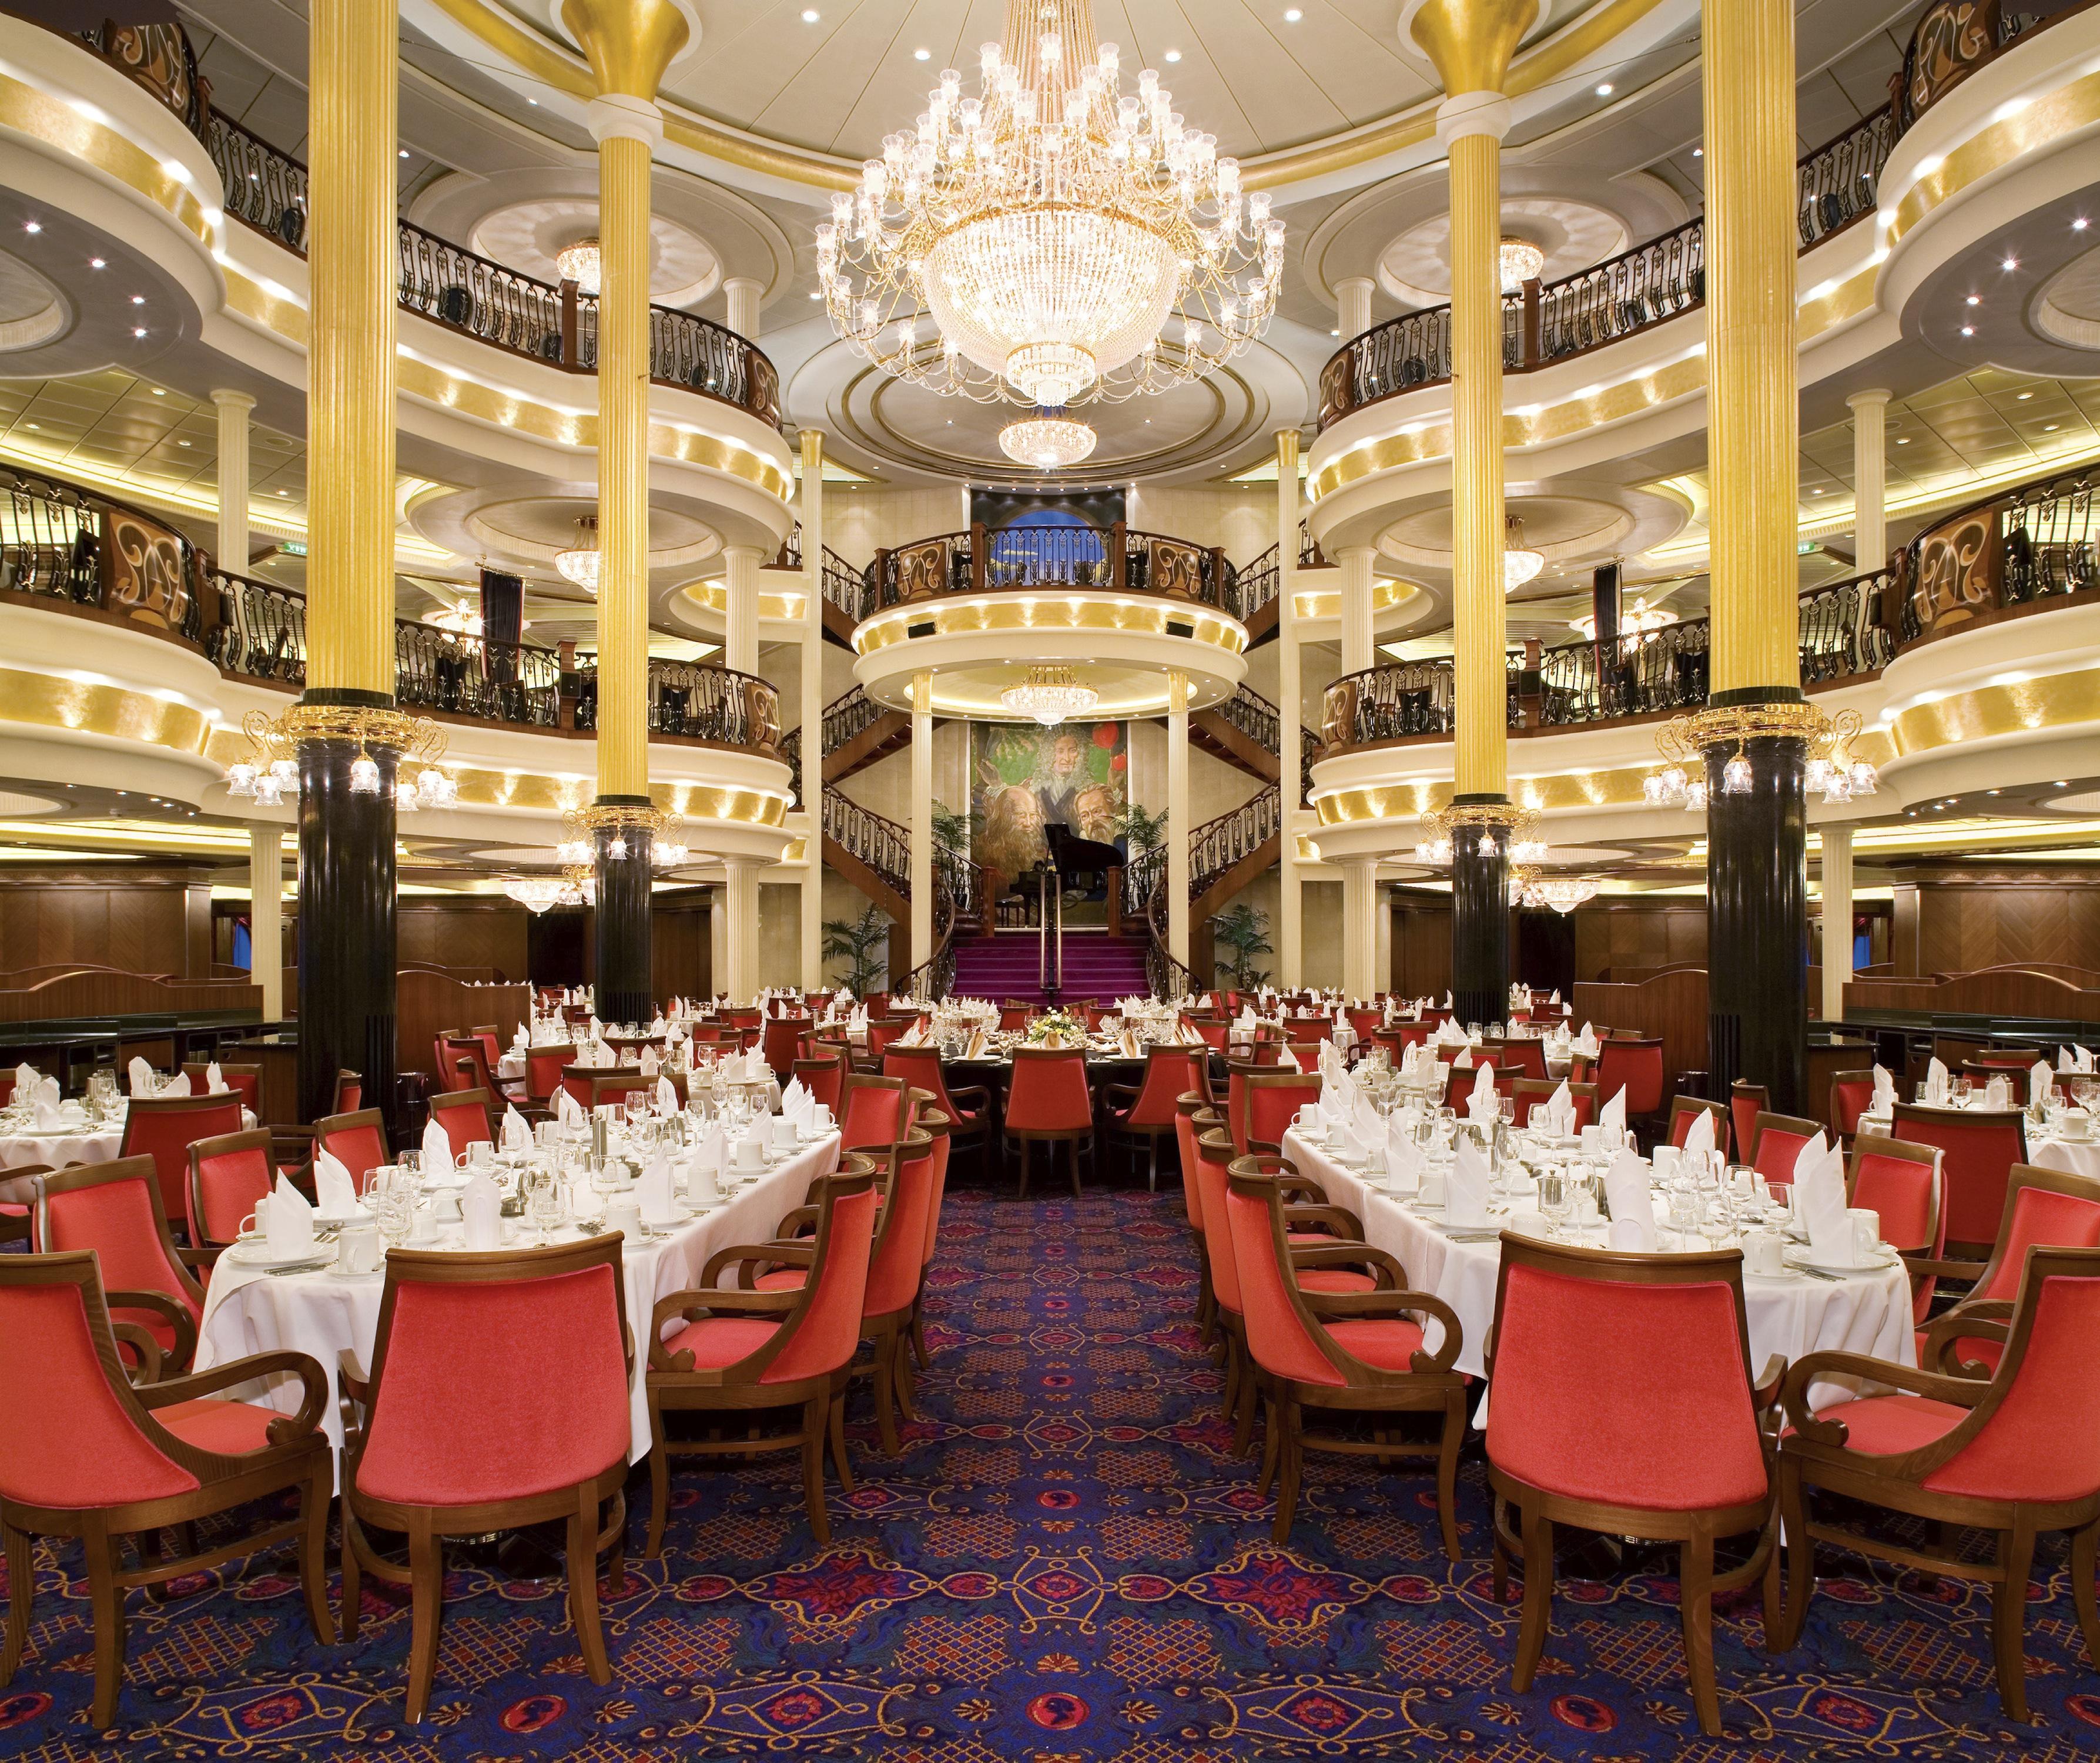 Royal Caribbean International Freedom of the Seas Interior Main Dining Room 1.jpeg